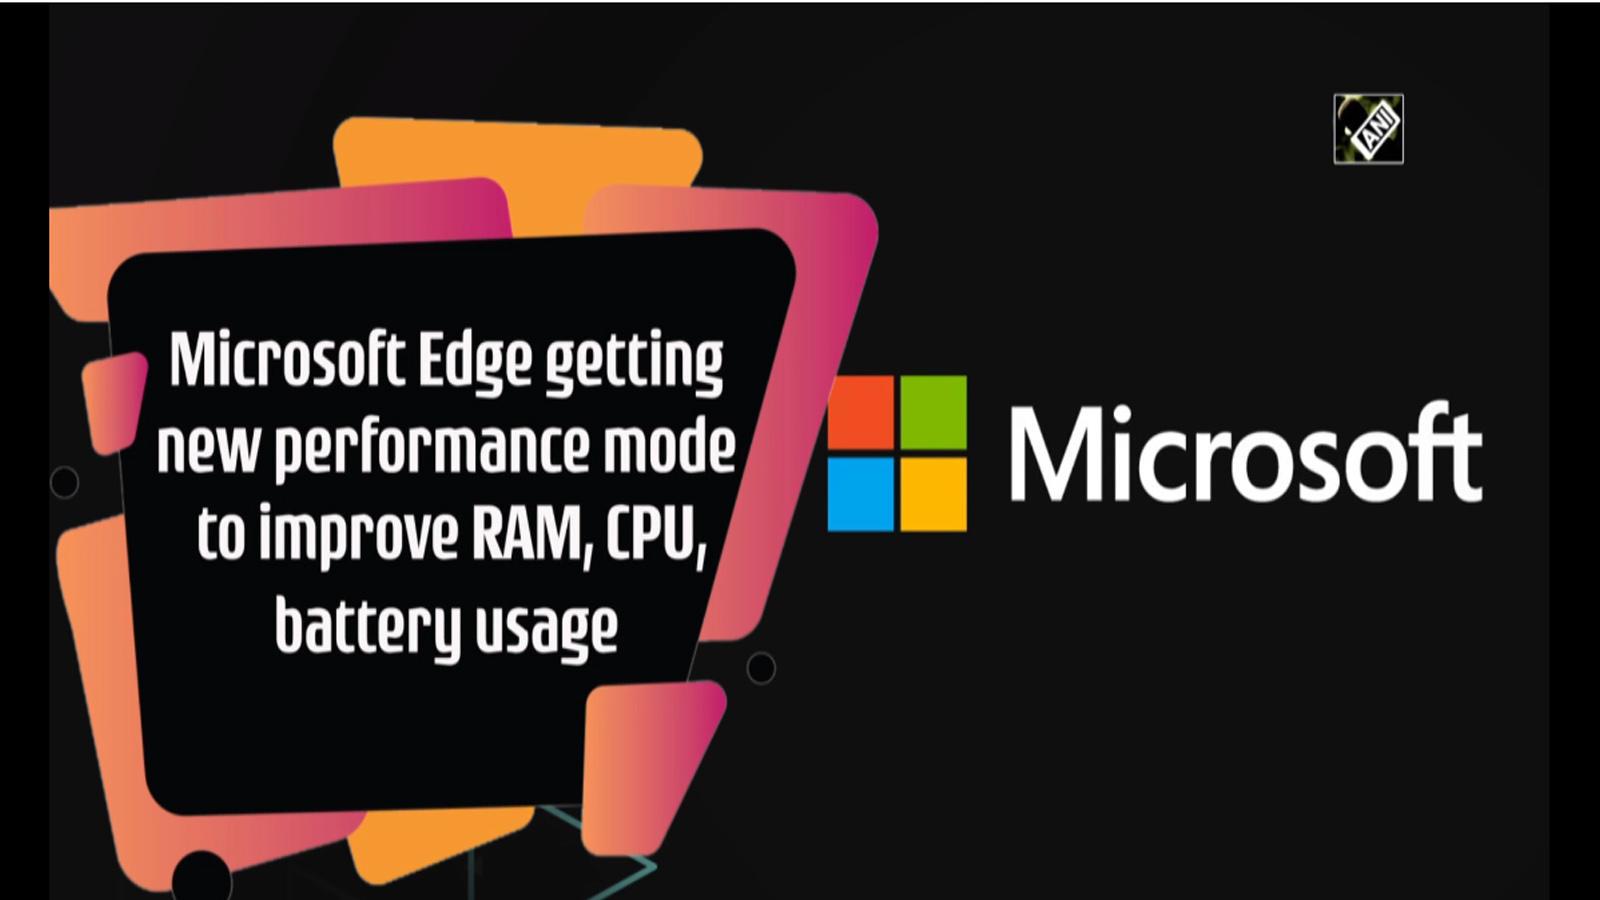 microsoft-edge-getting-new-performance-mode-to-improve-ram-cpu-battery-usage